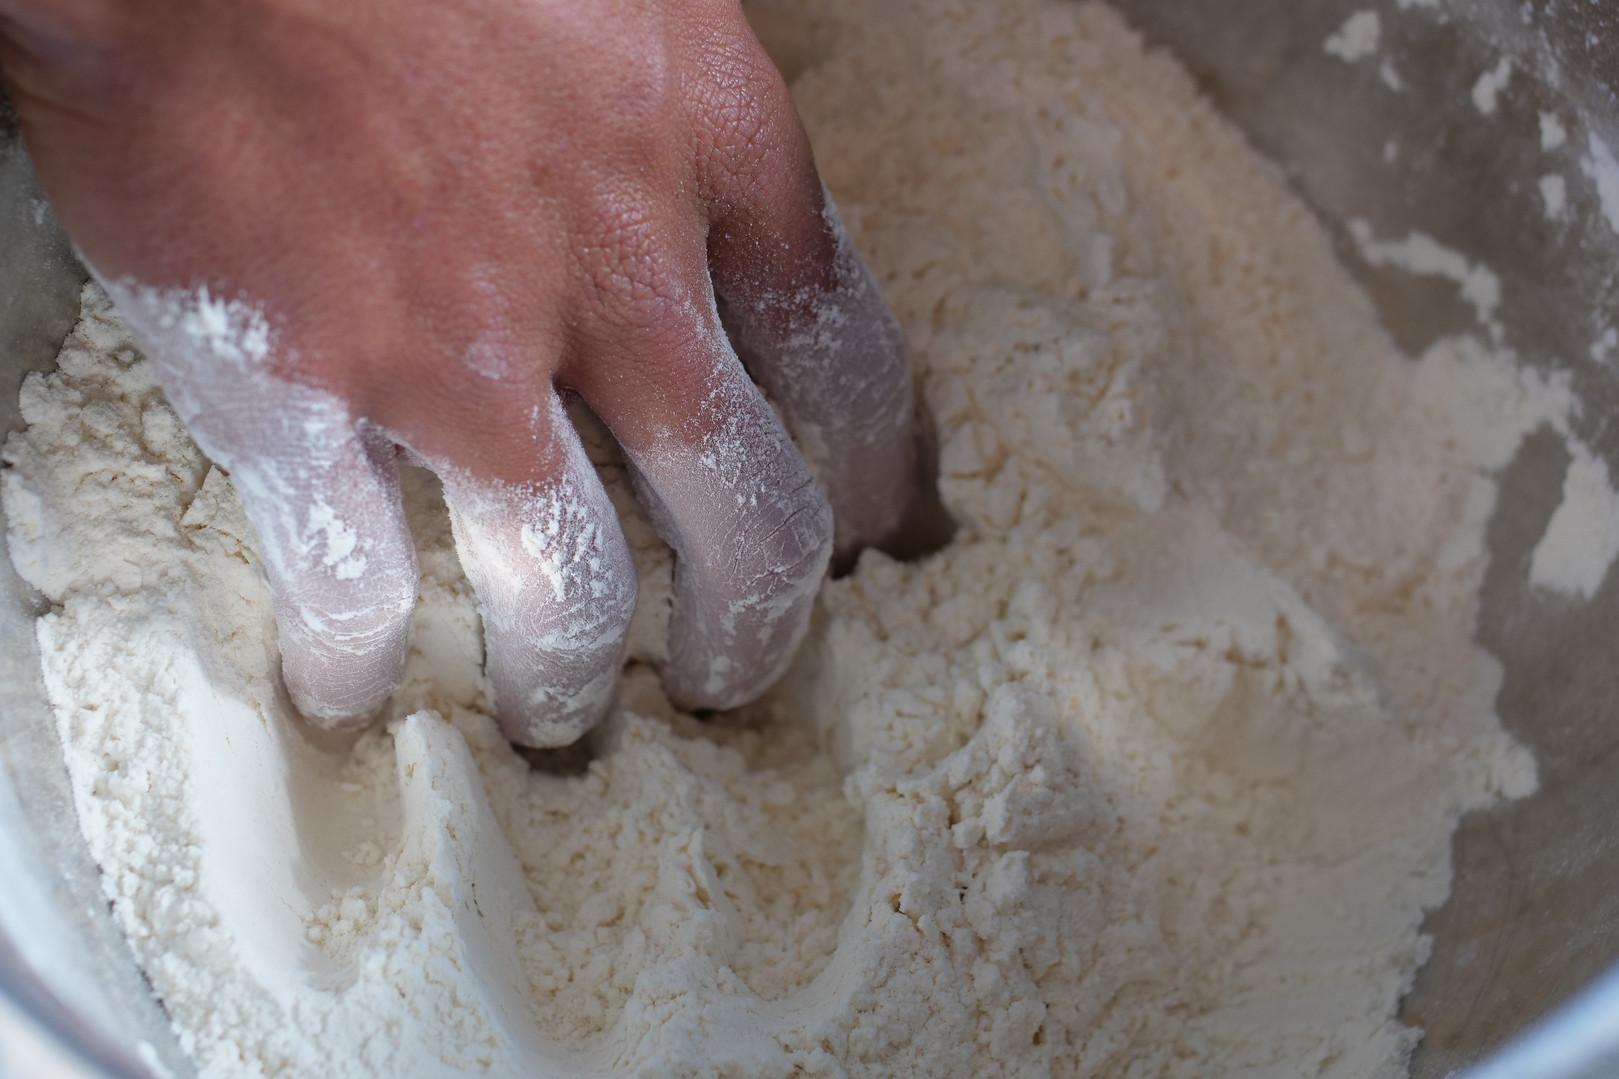 High quality flour